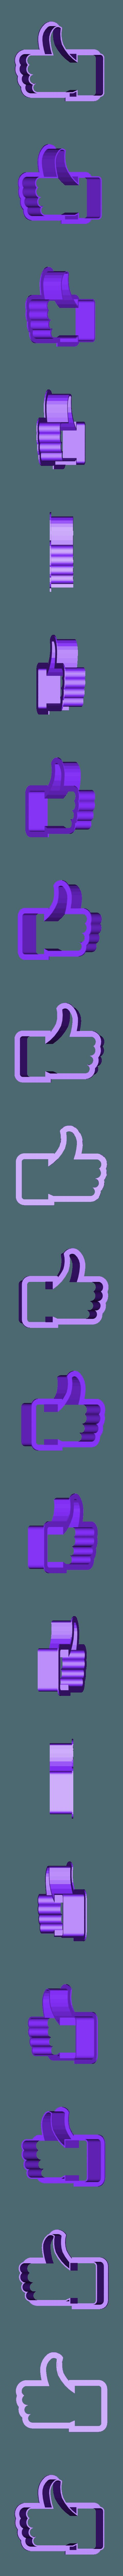 like.stl Download STL file Emoji cookie cutter set • 3D print design, davidruizo